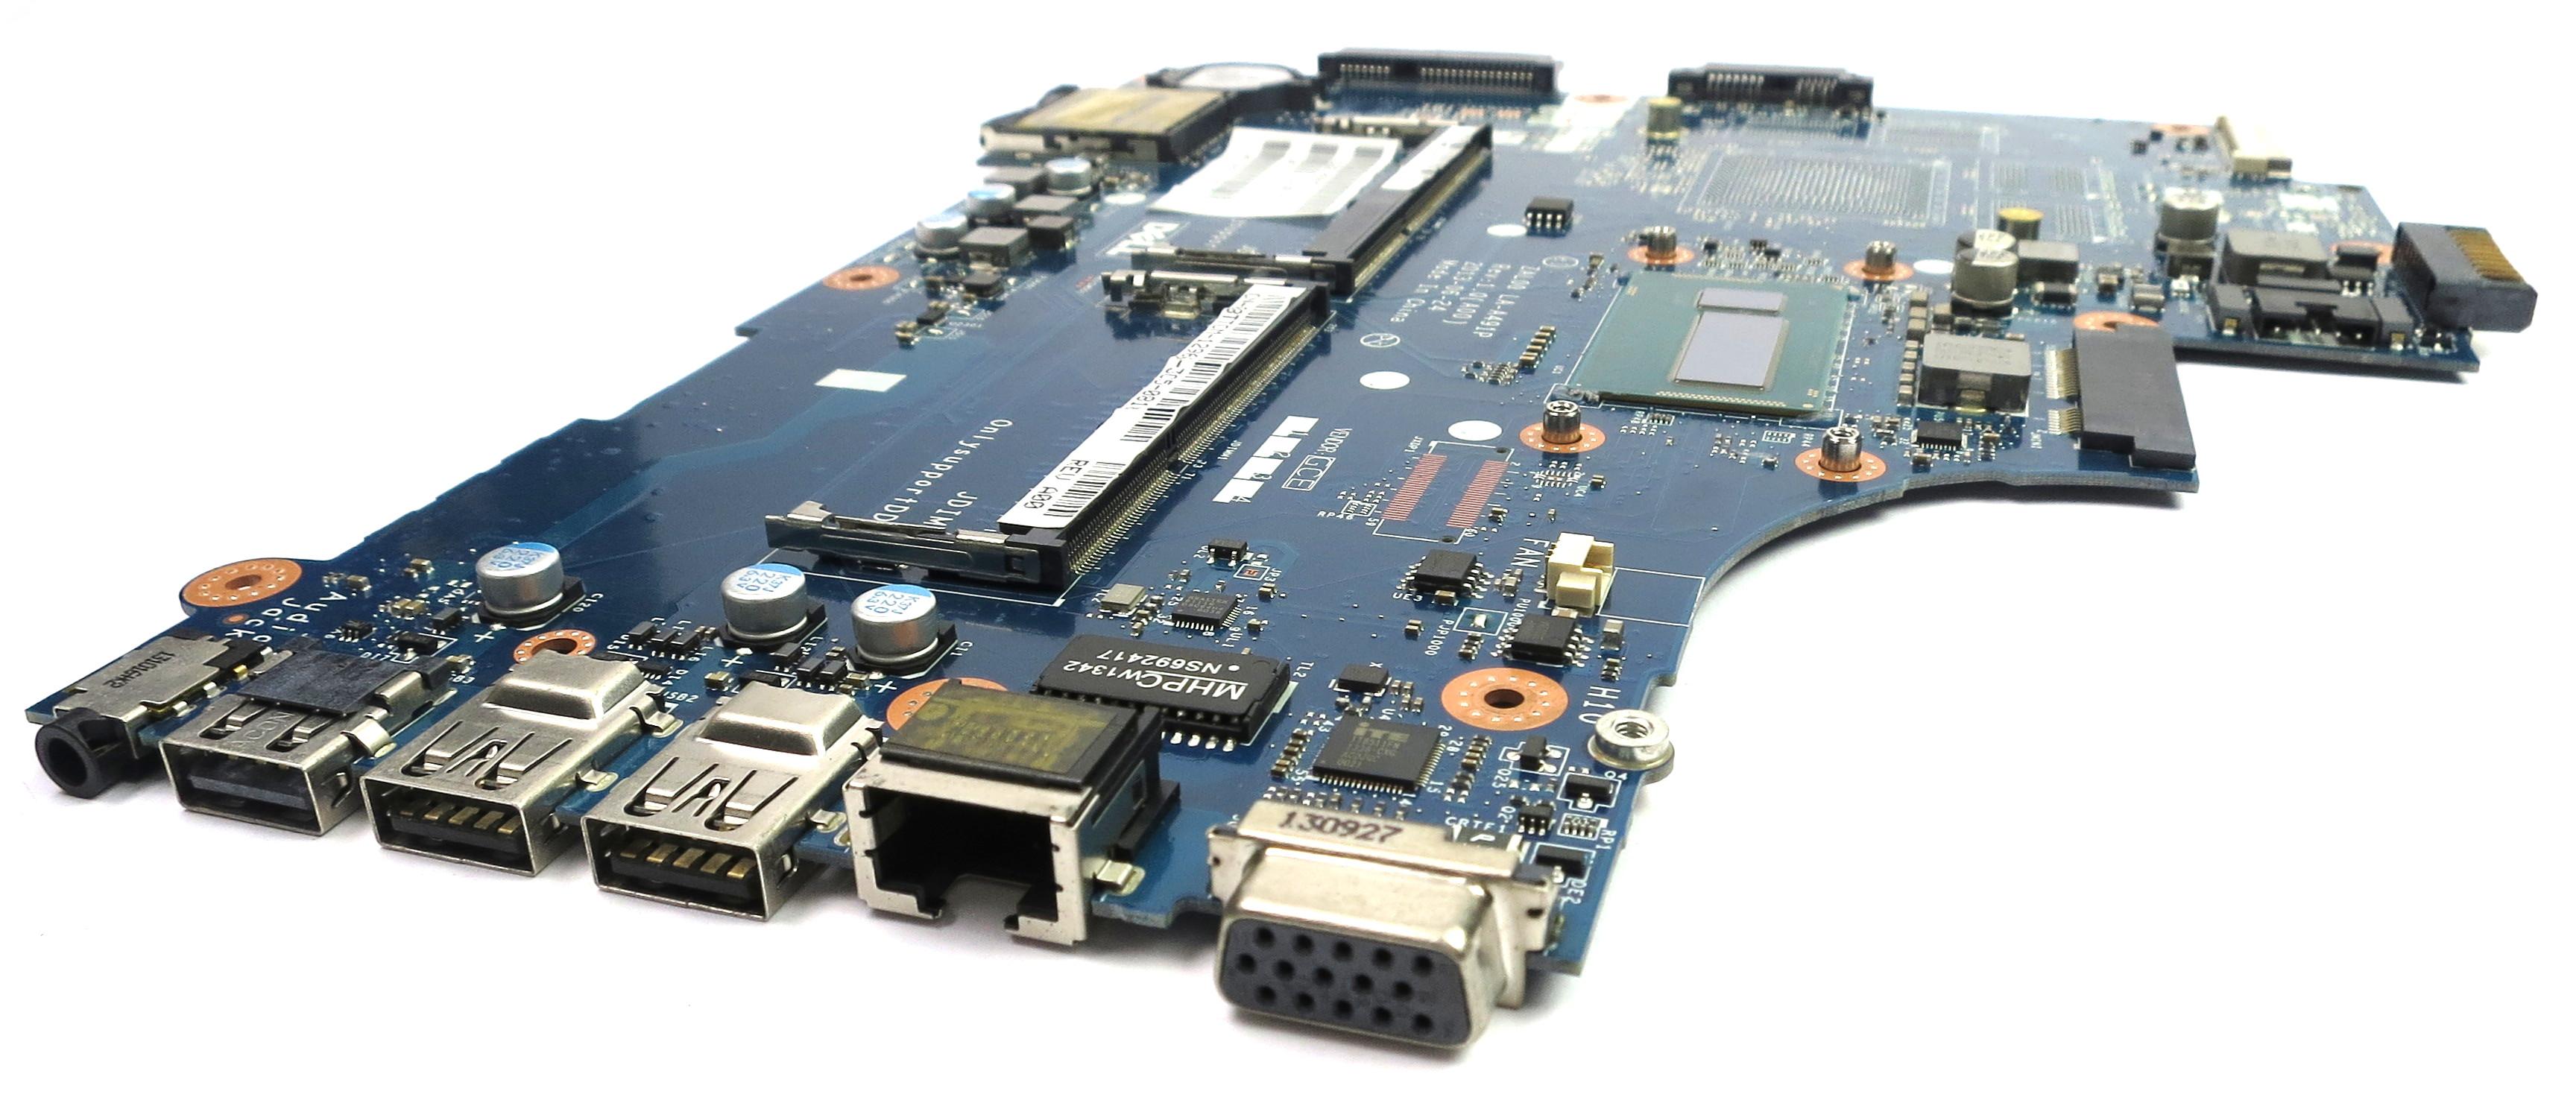 Dell 8TTCM Latitude 3540 Motherboard with Intel Core i3-4010U Processor